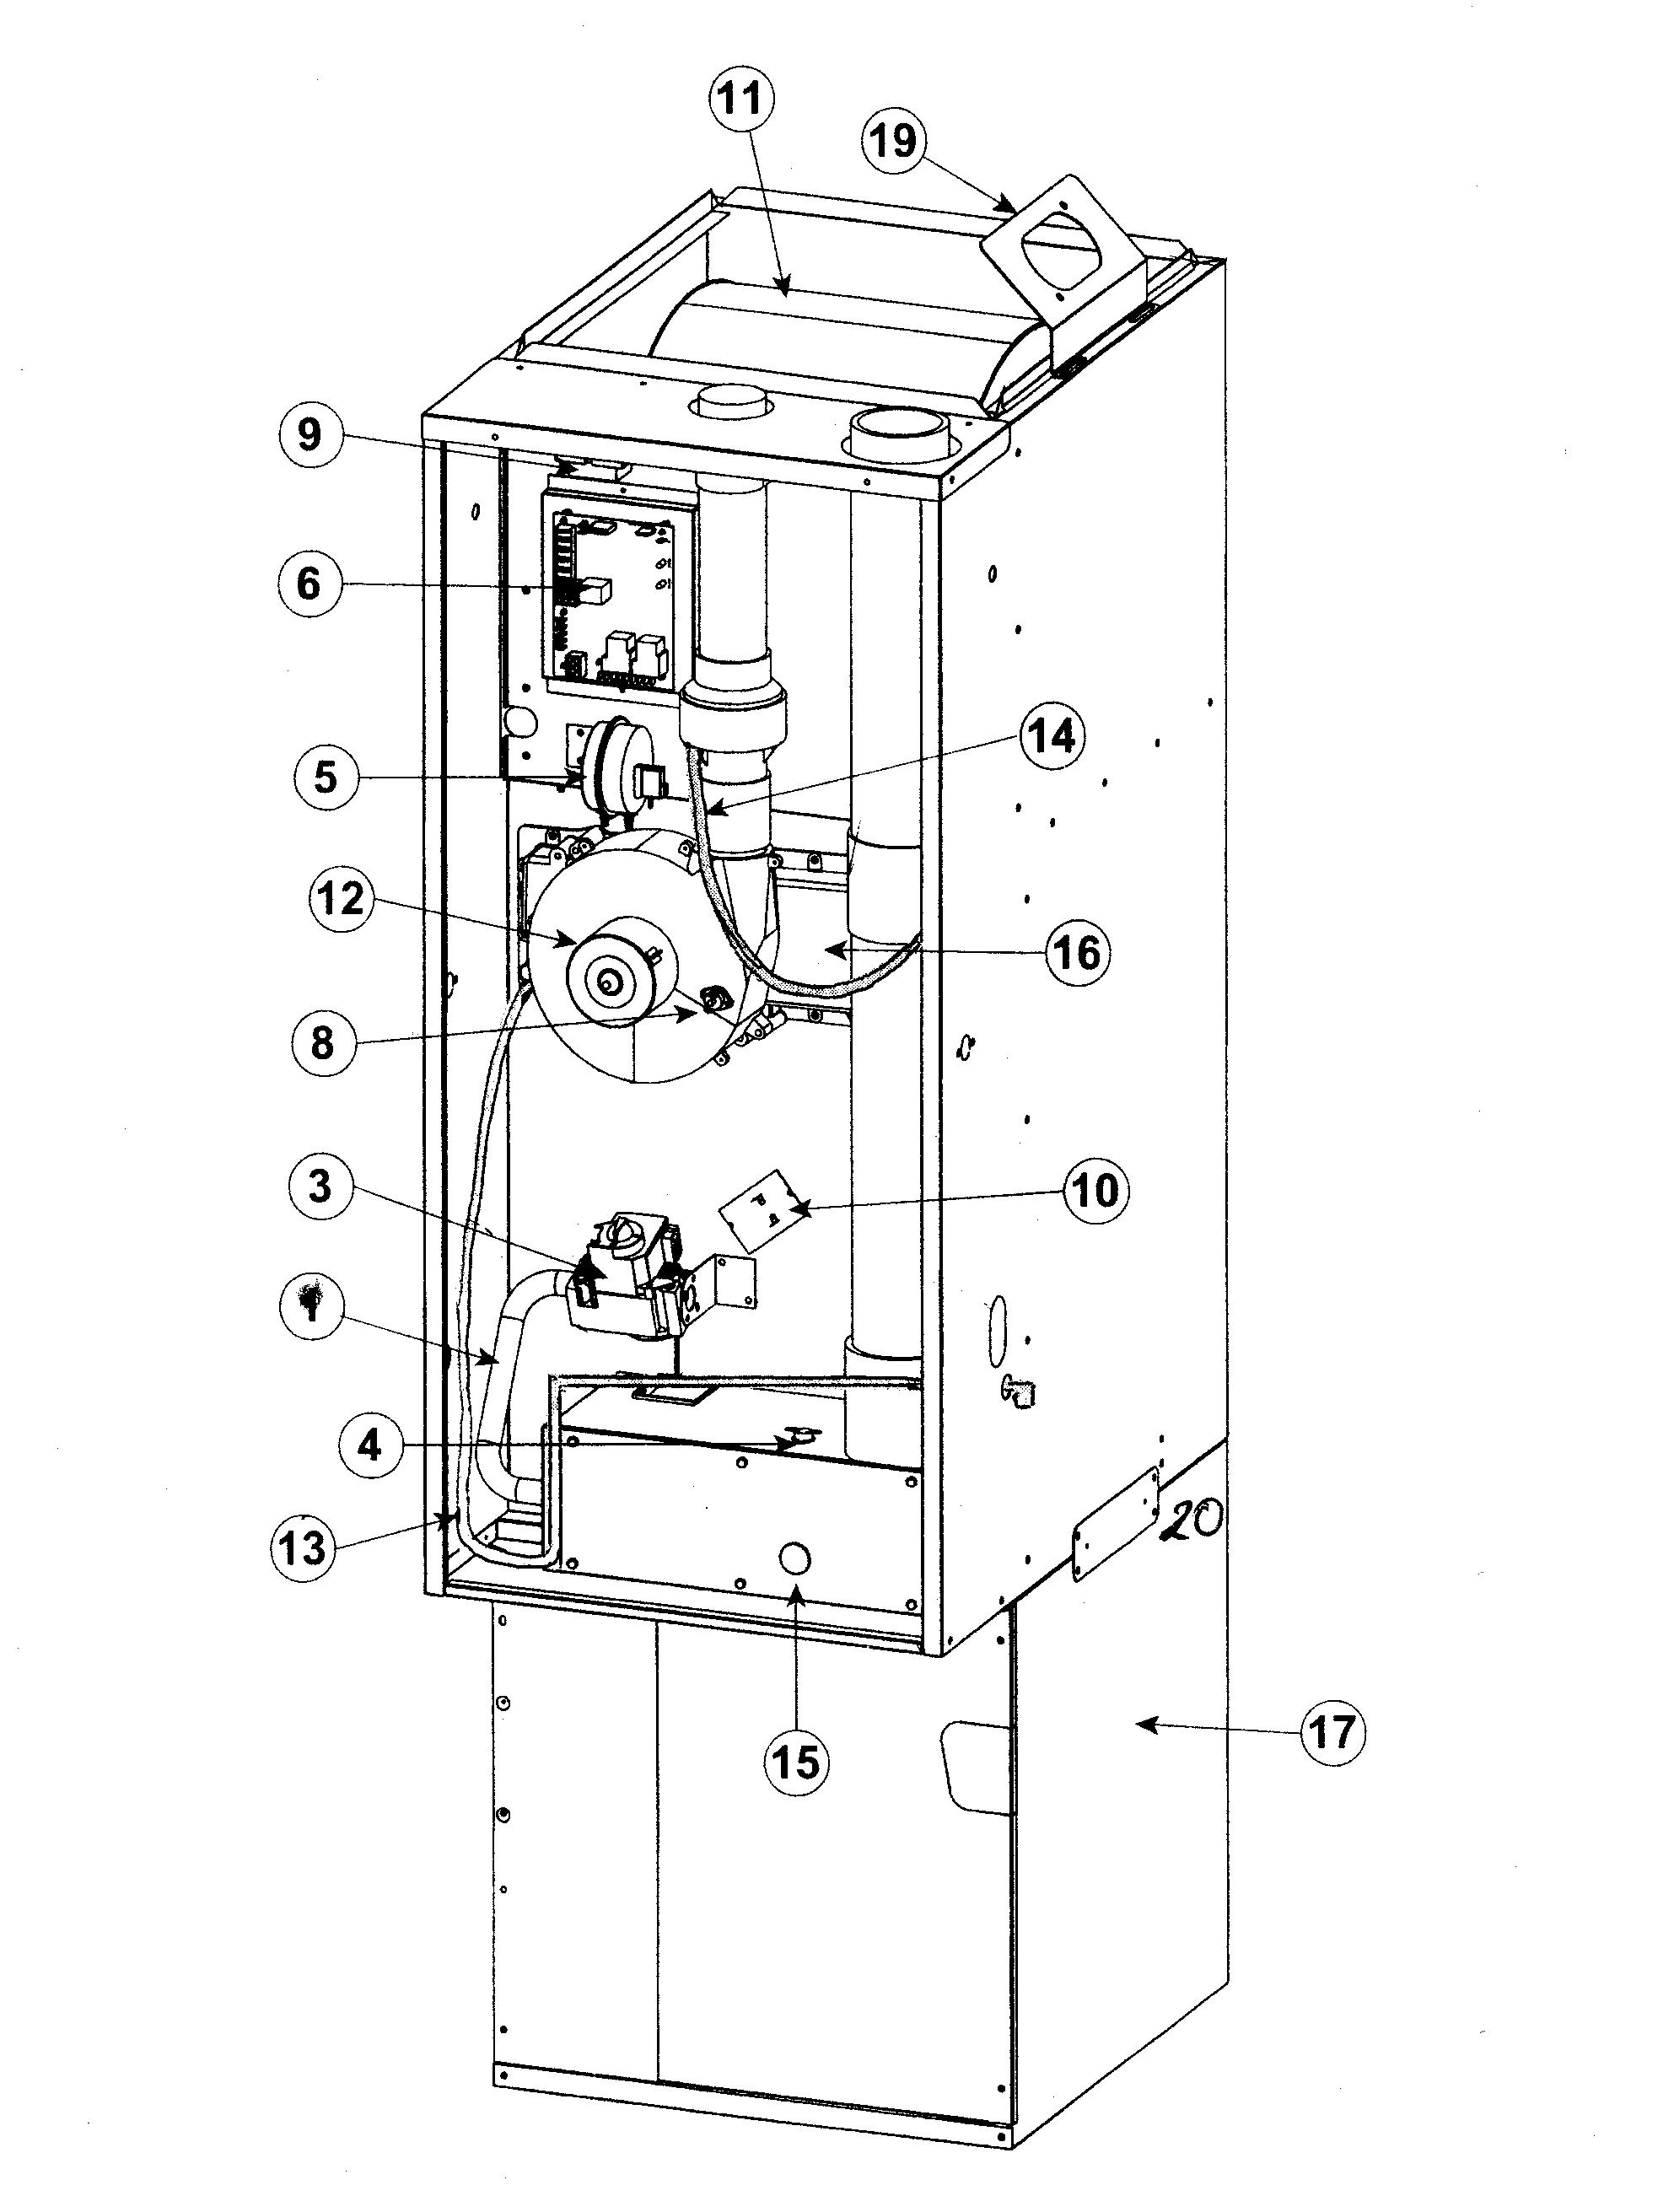 nordyne gas furnace wiring schematics nordyne model e2eb